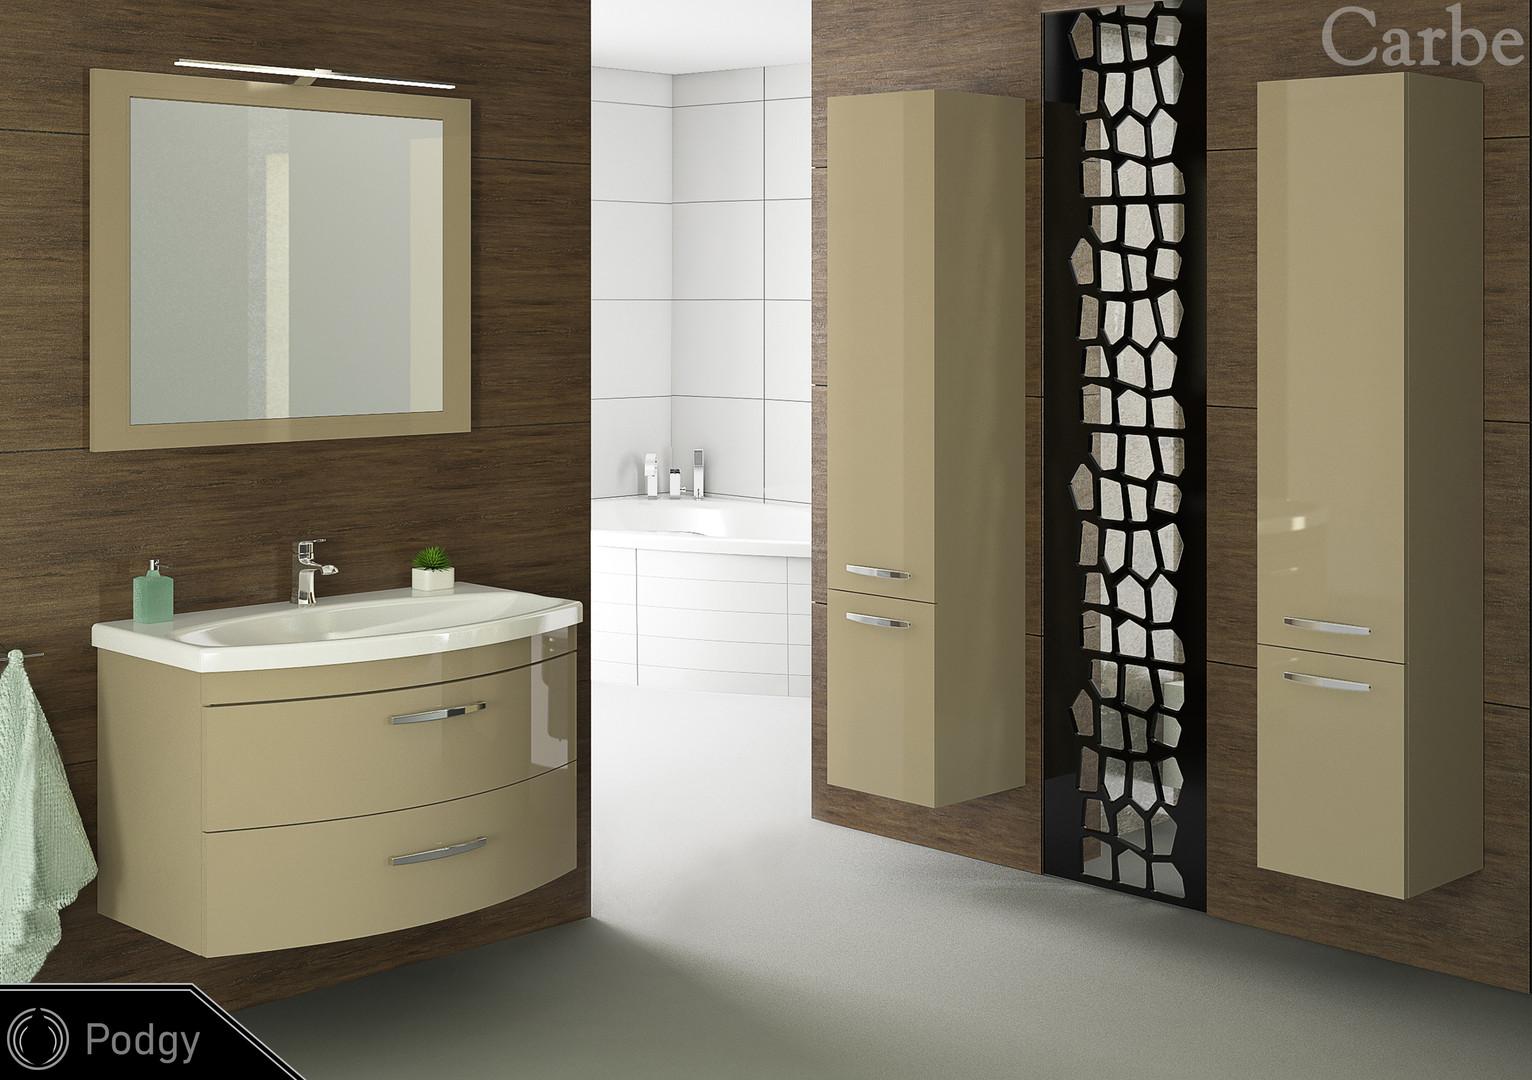 Podgy - Cappucino HG, Dolmite Washbasin, Soft Closing